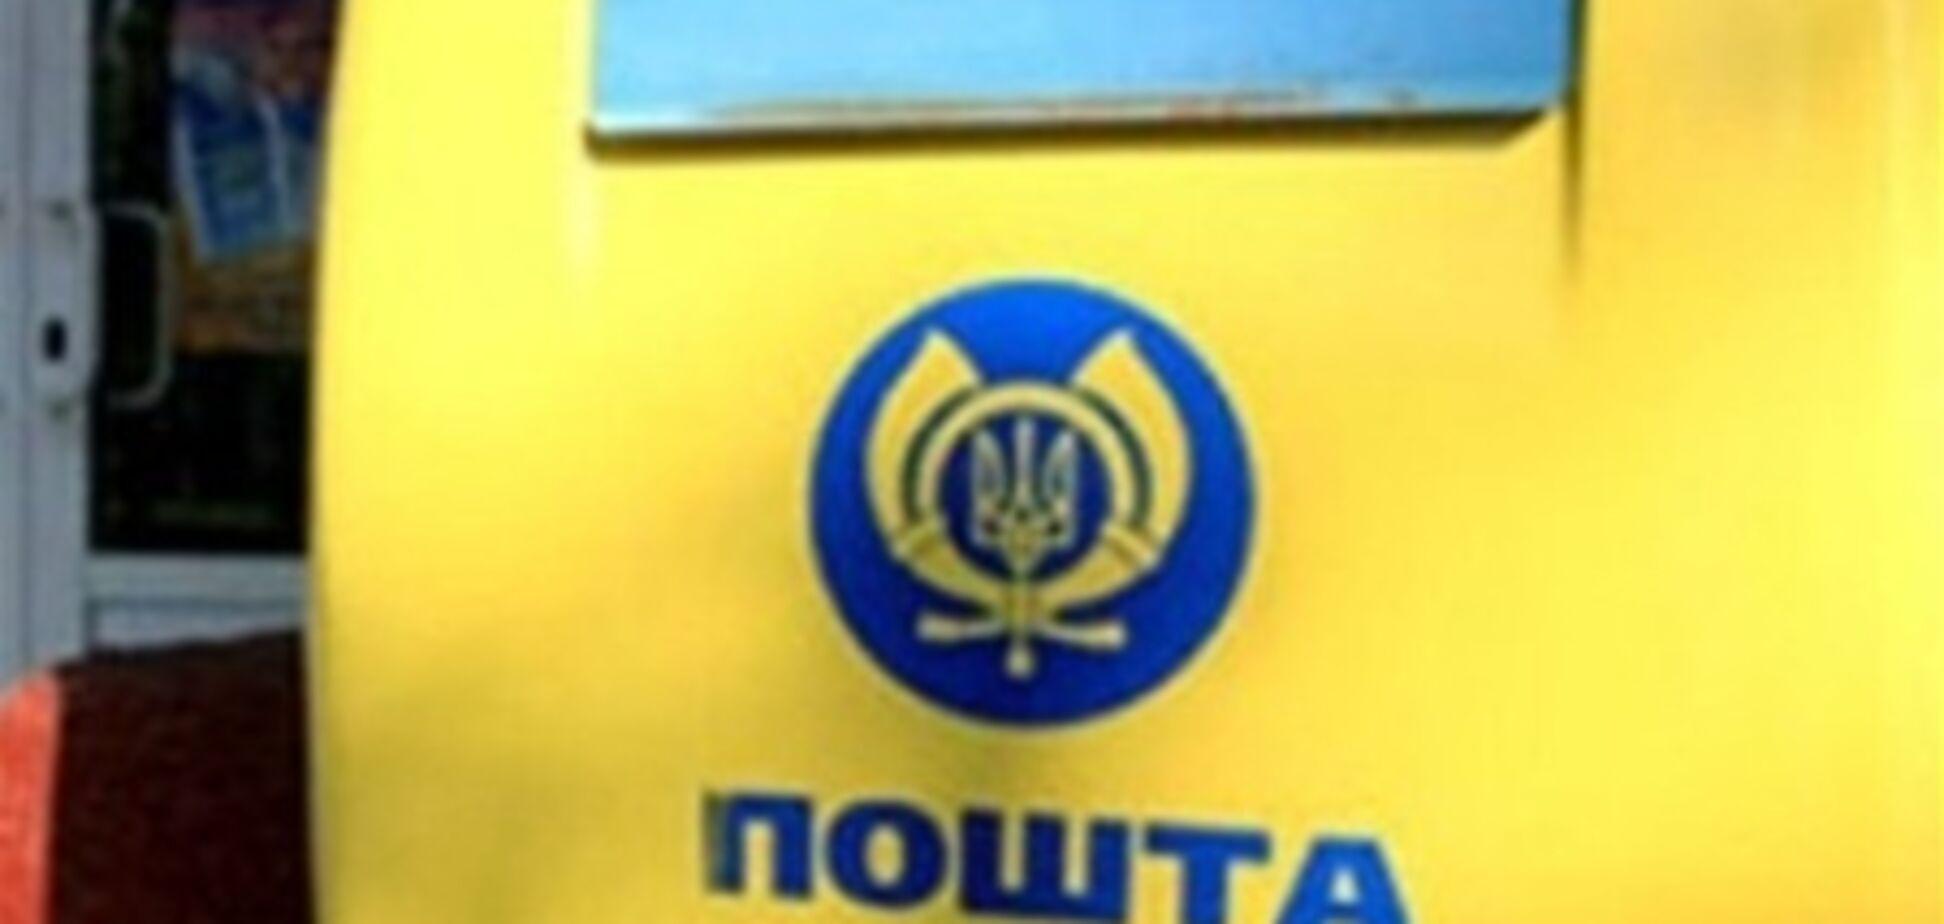 'Укрпочта' заказала ремонт техники на 0,3 млн у своего ревизора